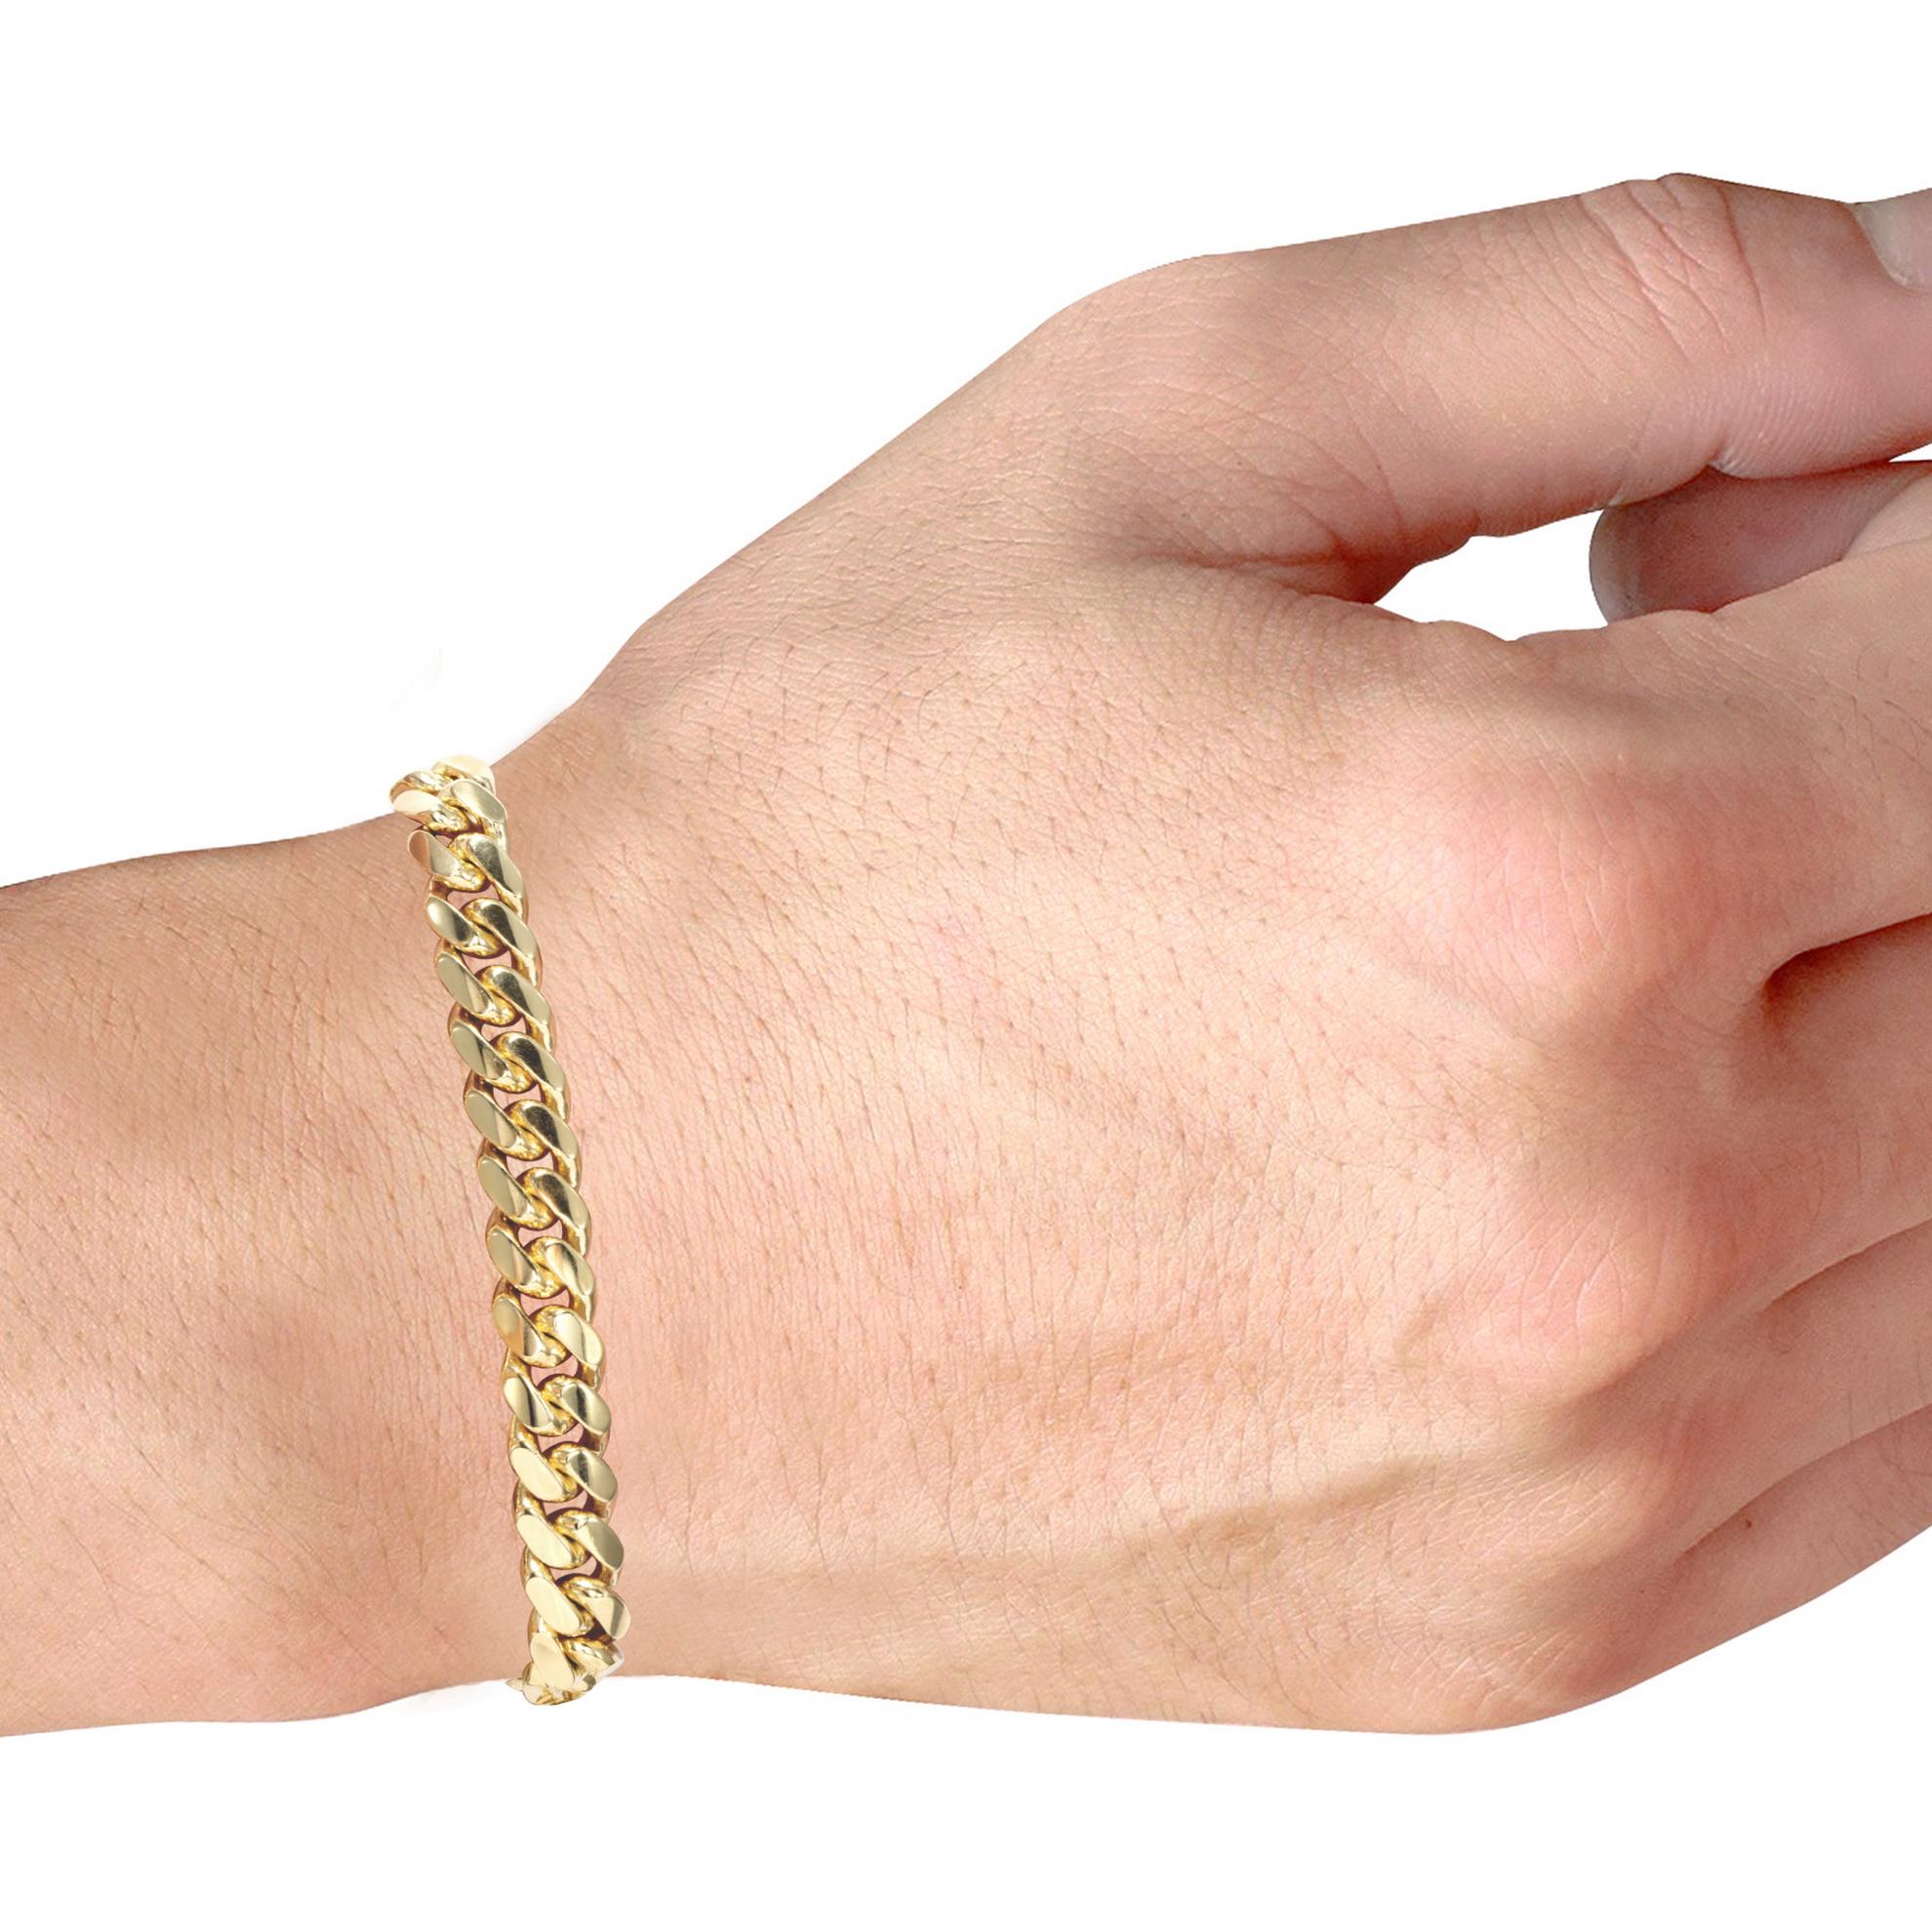 Para Hombre 316L Acero Inoxidable 14K oro tono sólido anillo de cubano de Miami 8-12 SB004G